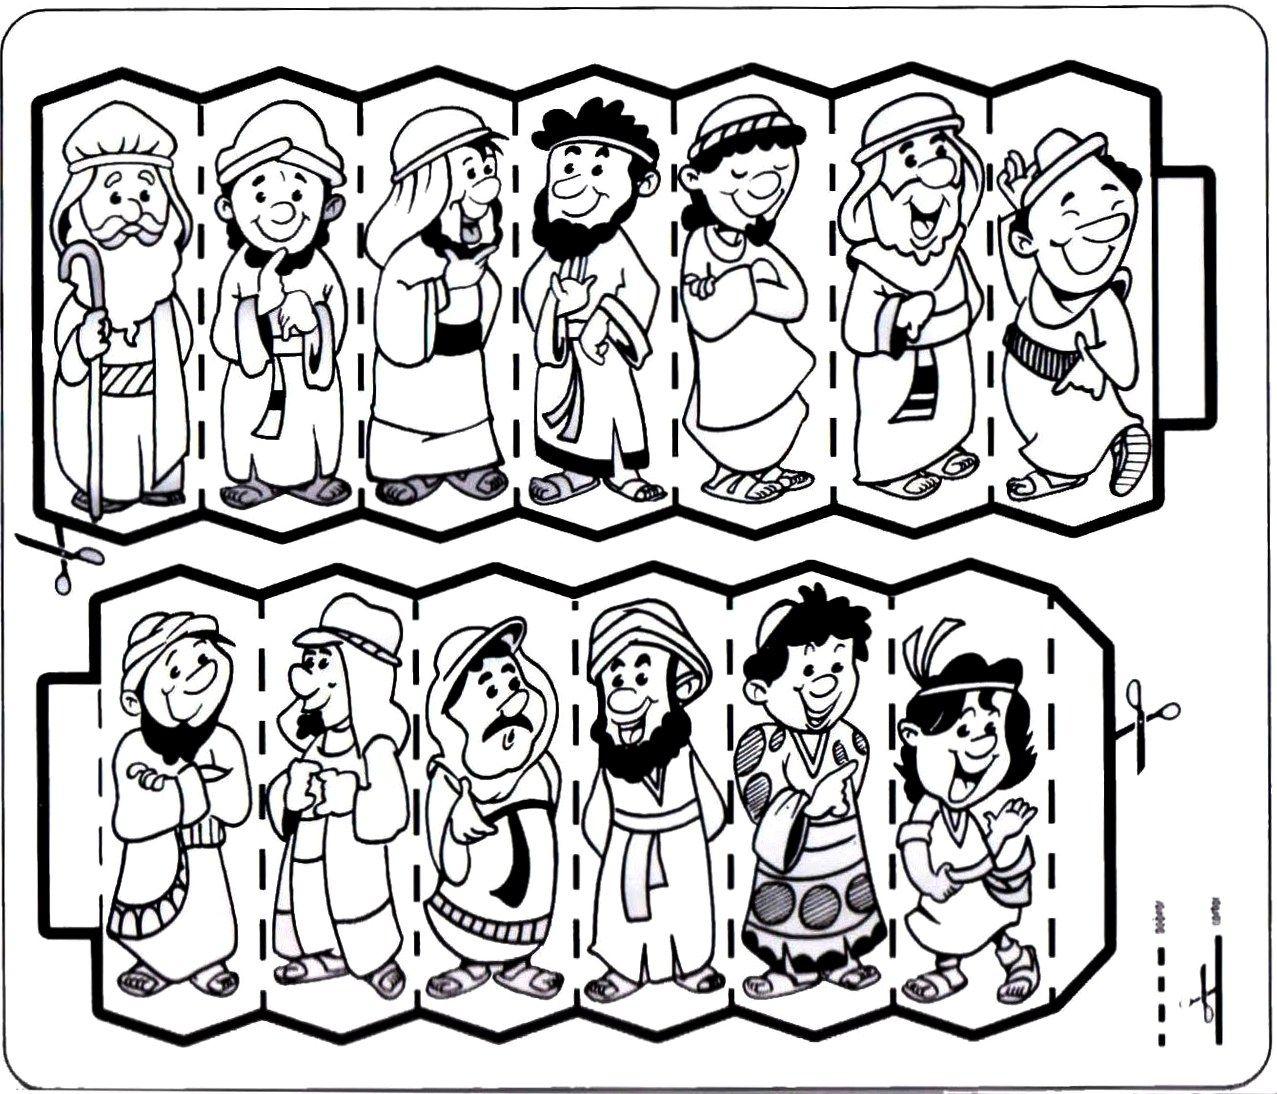 De zonen van Isaac // The sons of Isaac // Apascentar os